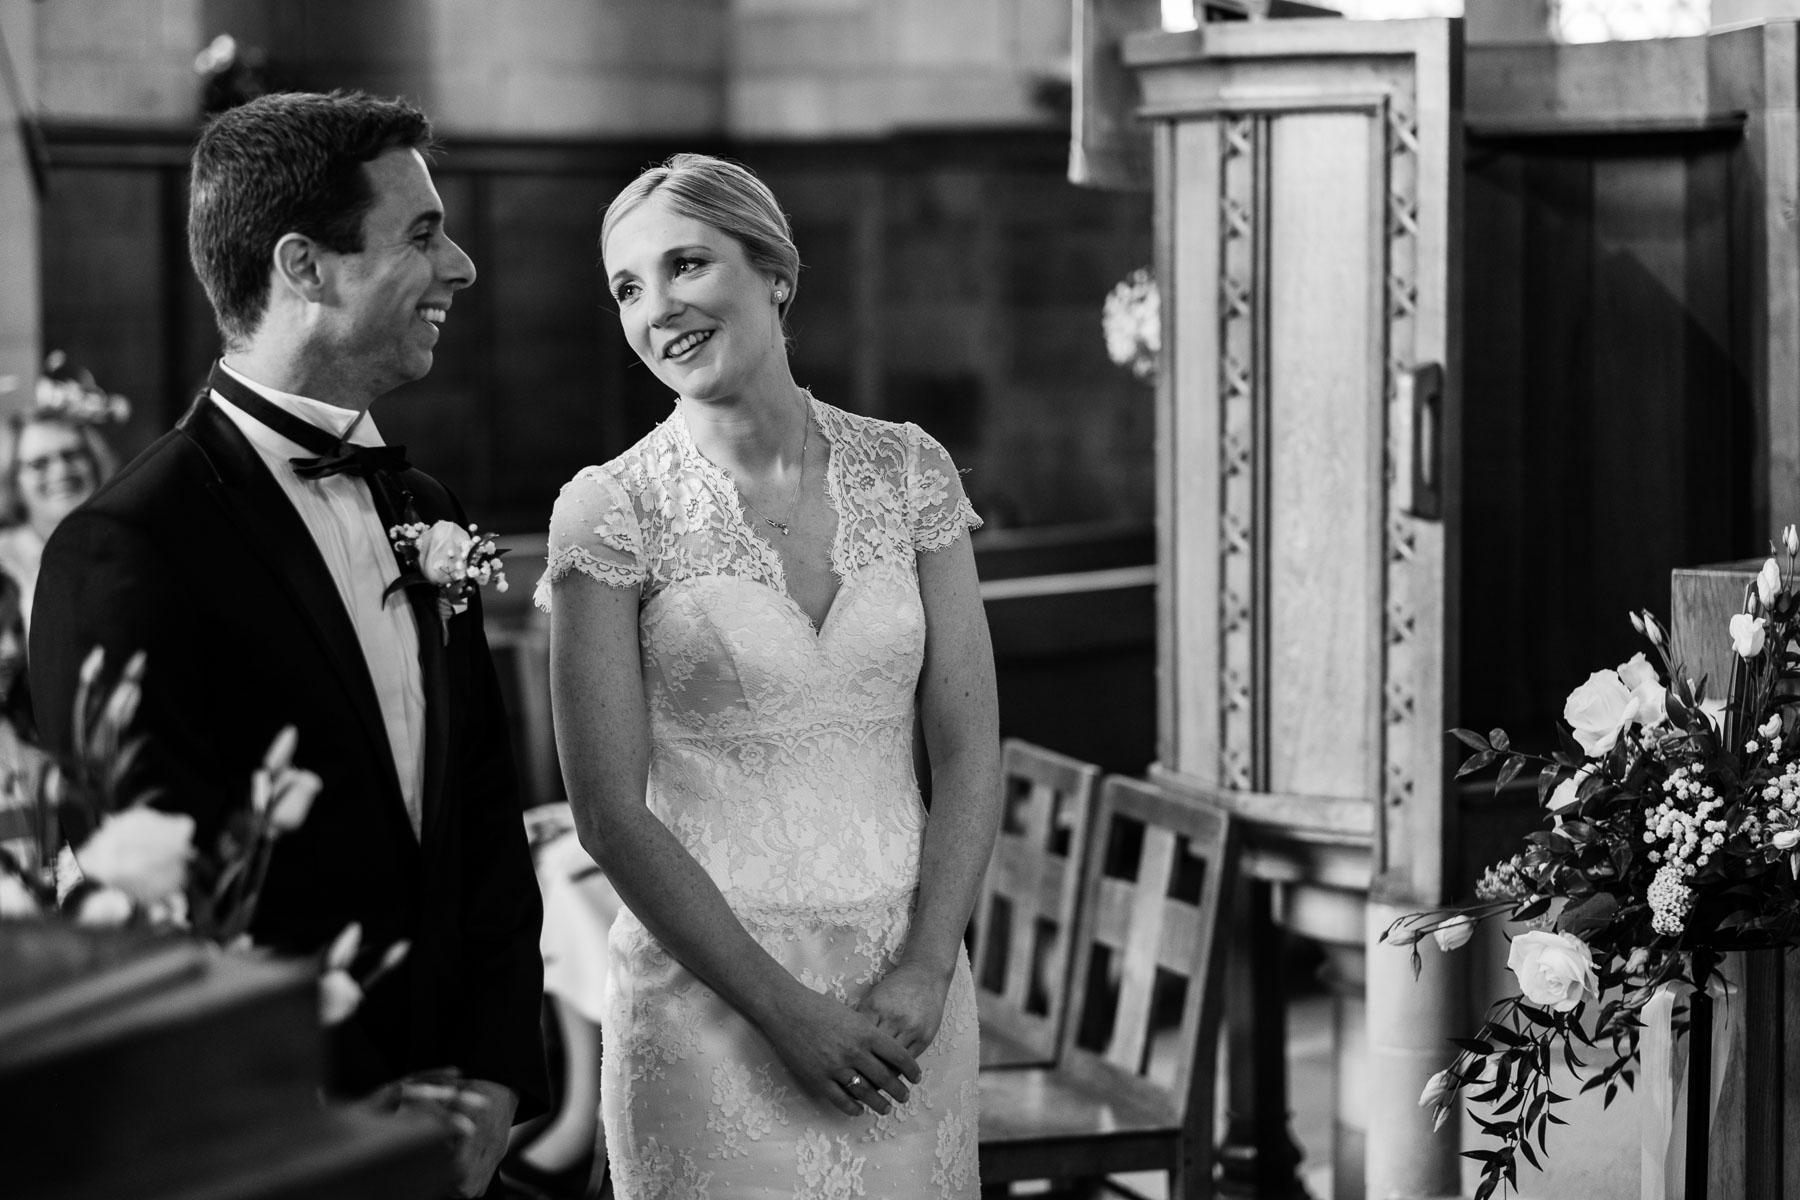 Crathorne Hall Wedding Photography - Jo & Paul (88).jpg